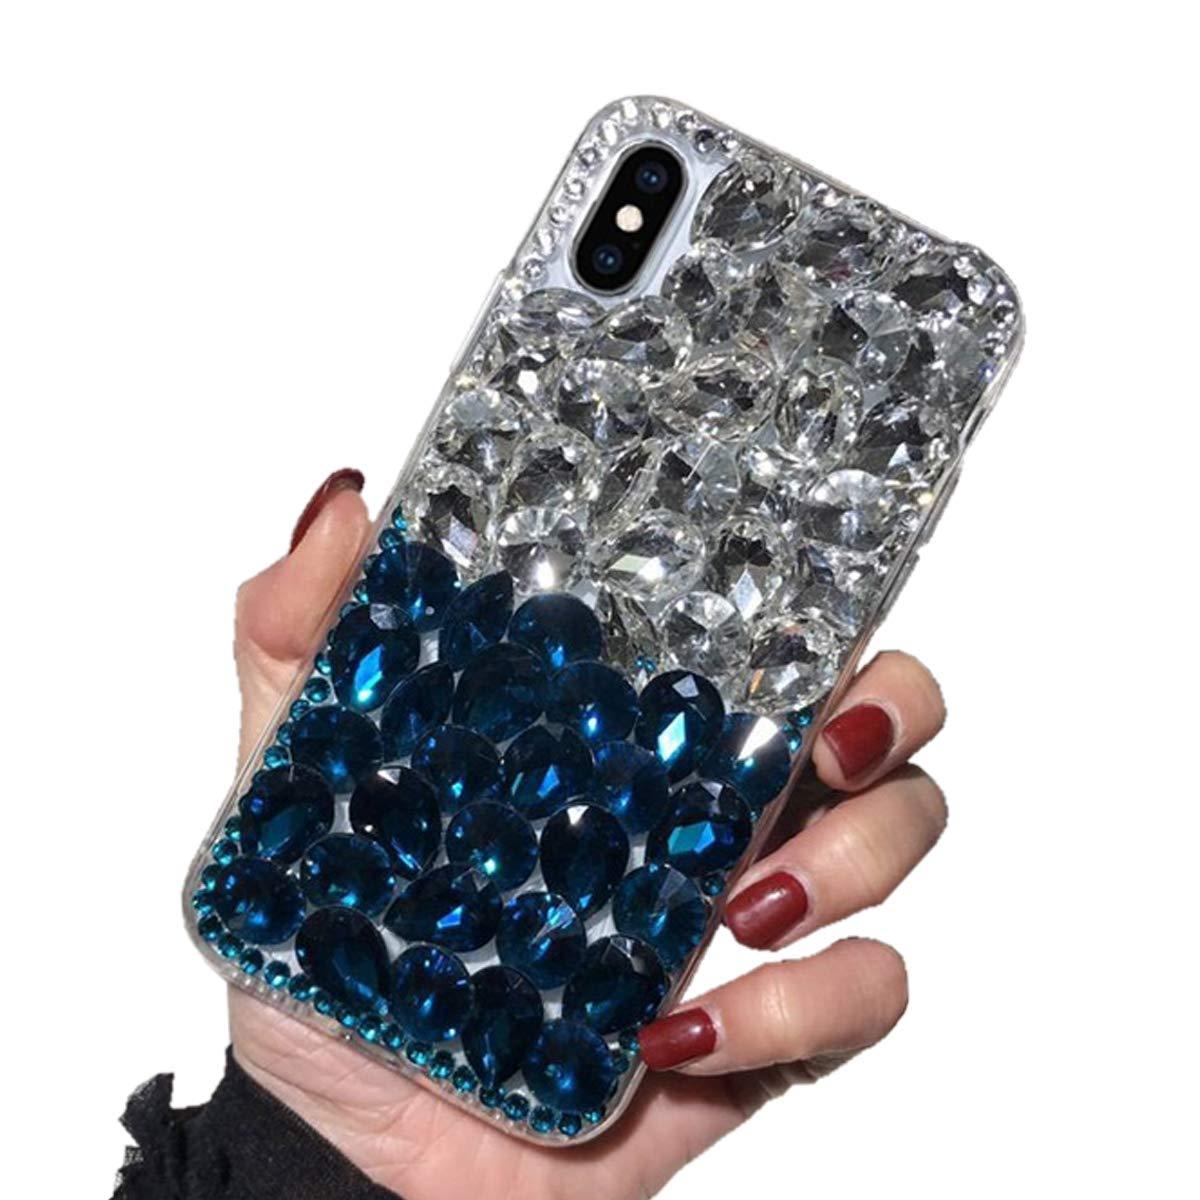 Luxus Glitzer Hü lle fü r Galaxy S9, Misstars 3D Bling Diamant Handyhü lle Transparent Hart PC Rü ckschale mit Silikon TPU Rahmen Schutzhü lle fü r Samsung Galaxy S9, Silber